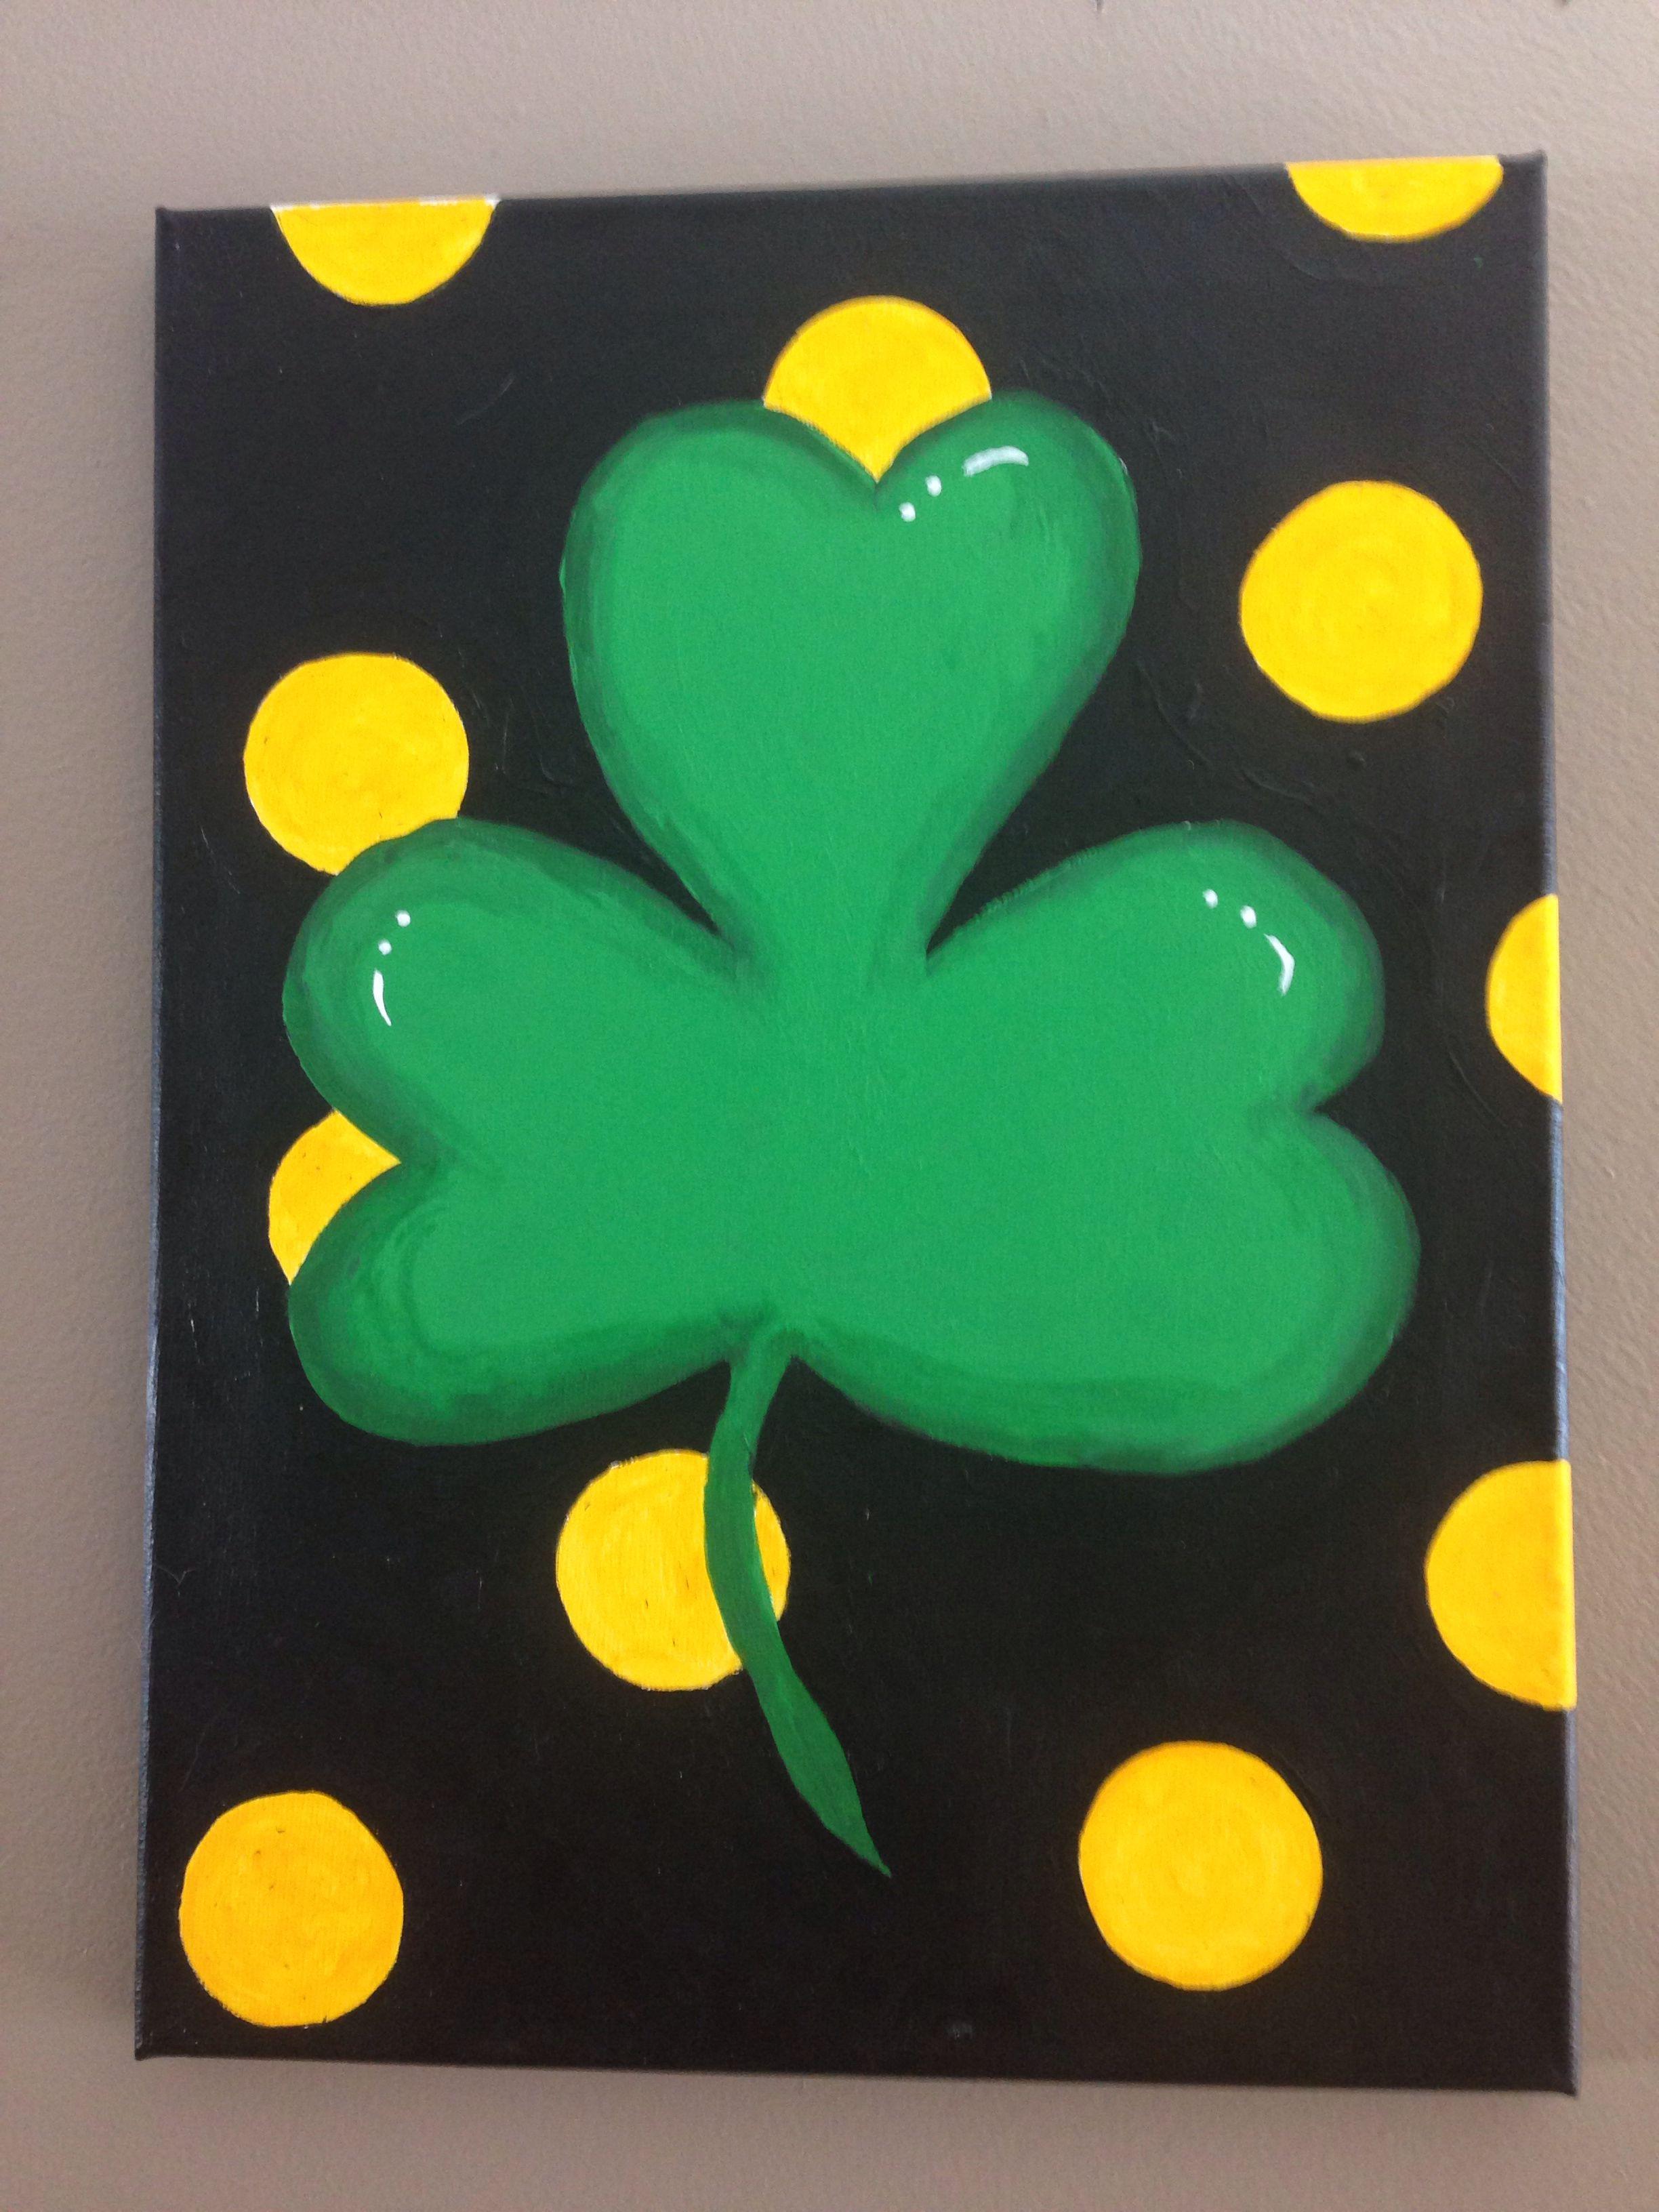 St Patricks Day Shamrock Canvas Painting Diy St Patrick S Day Crafts St Patricks Day Crafts For Kids St Patrick S Day Crafts